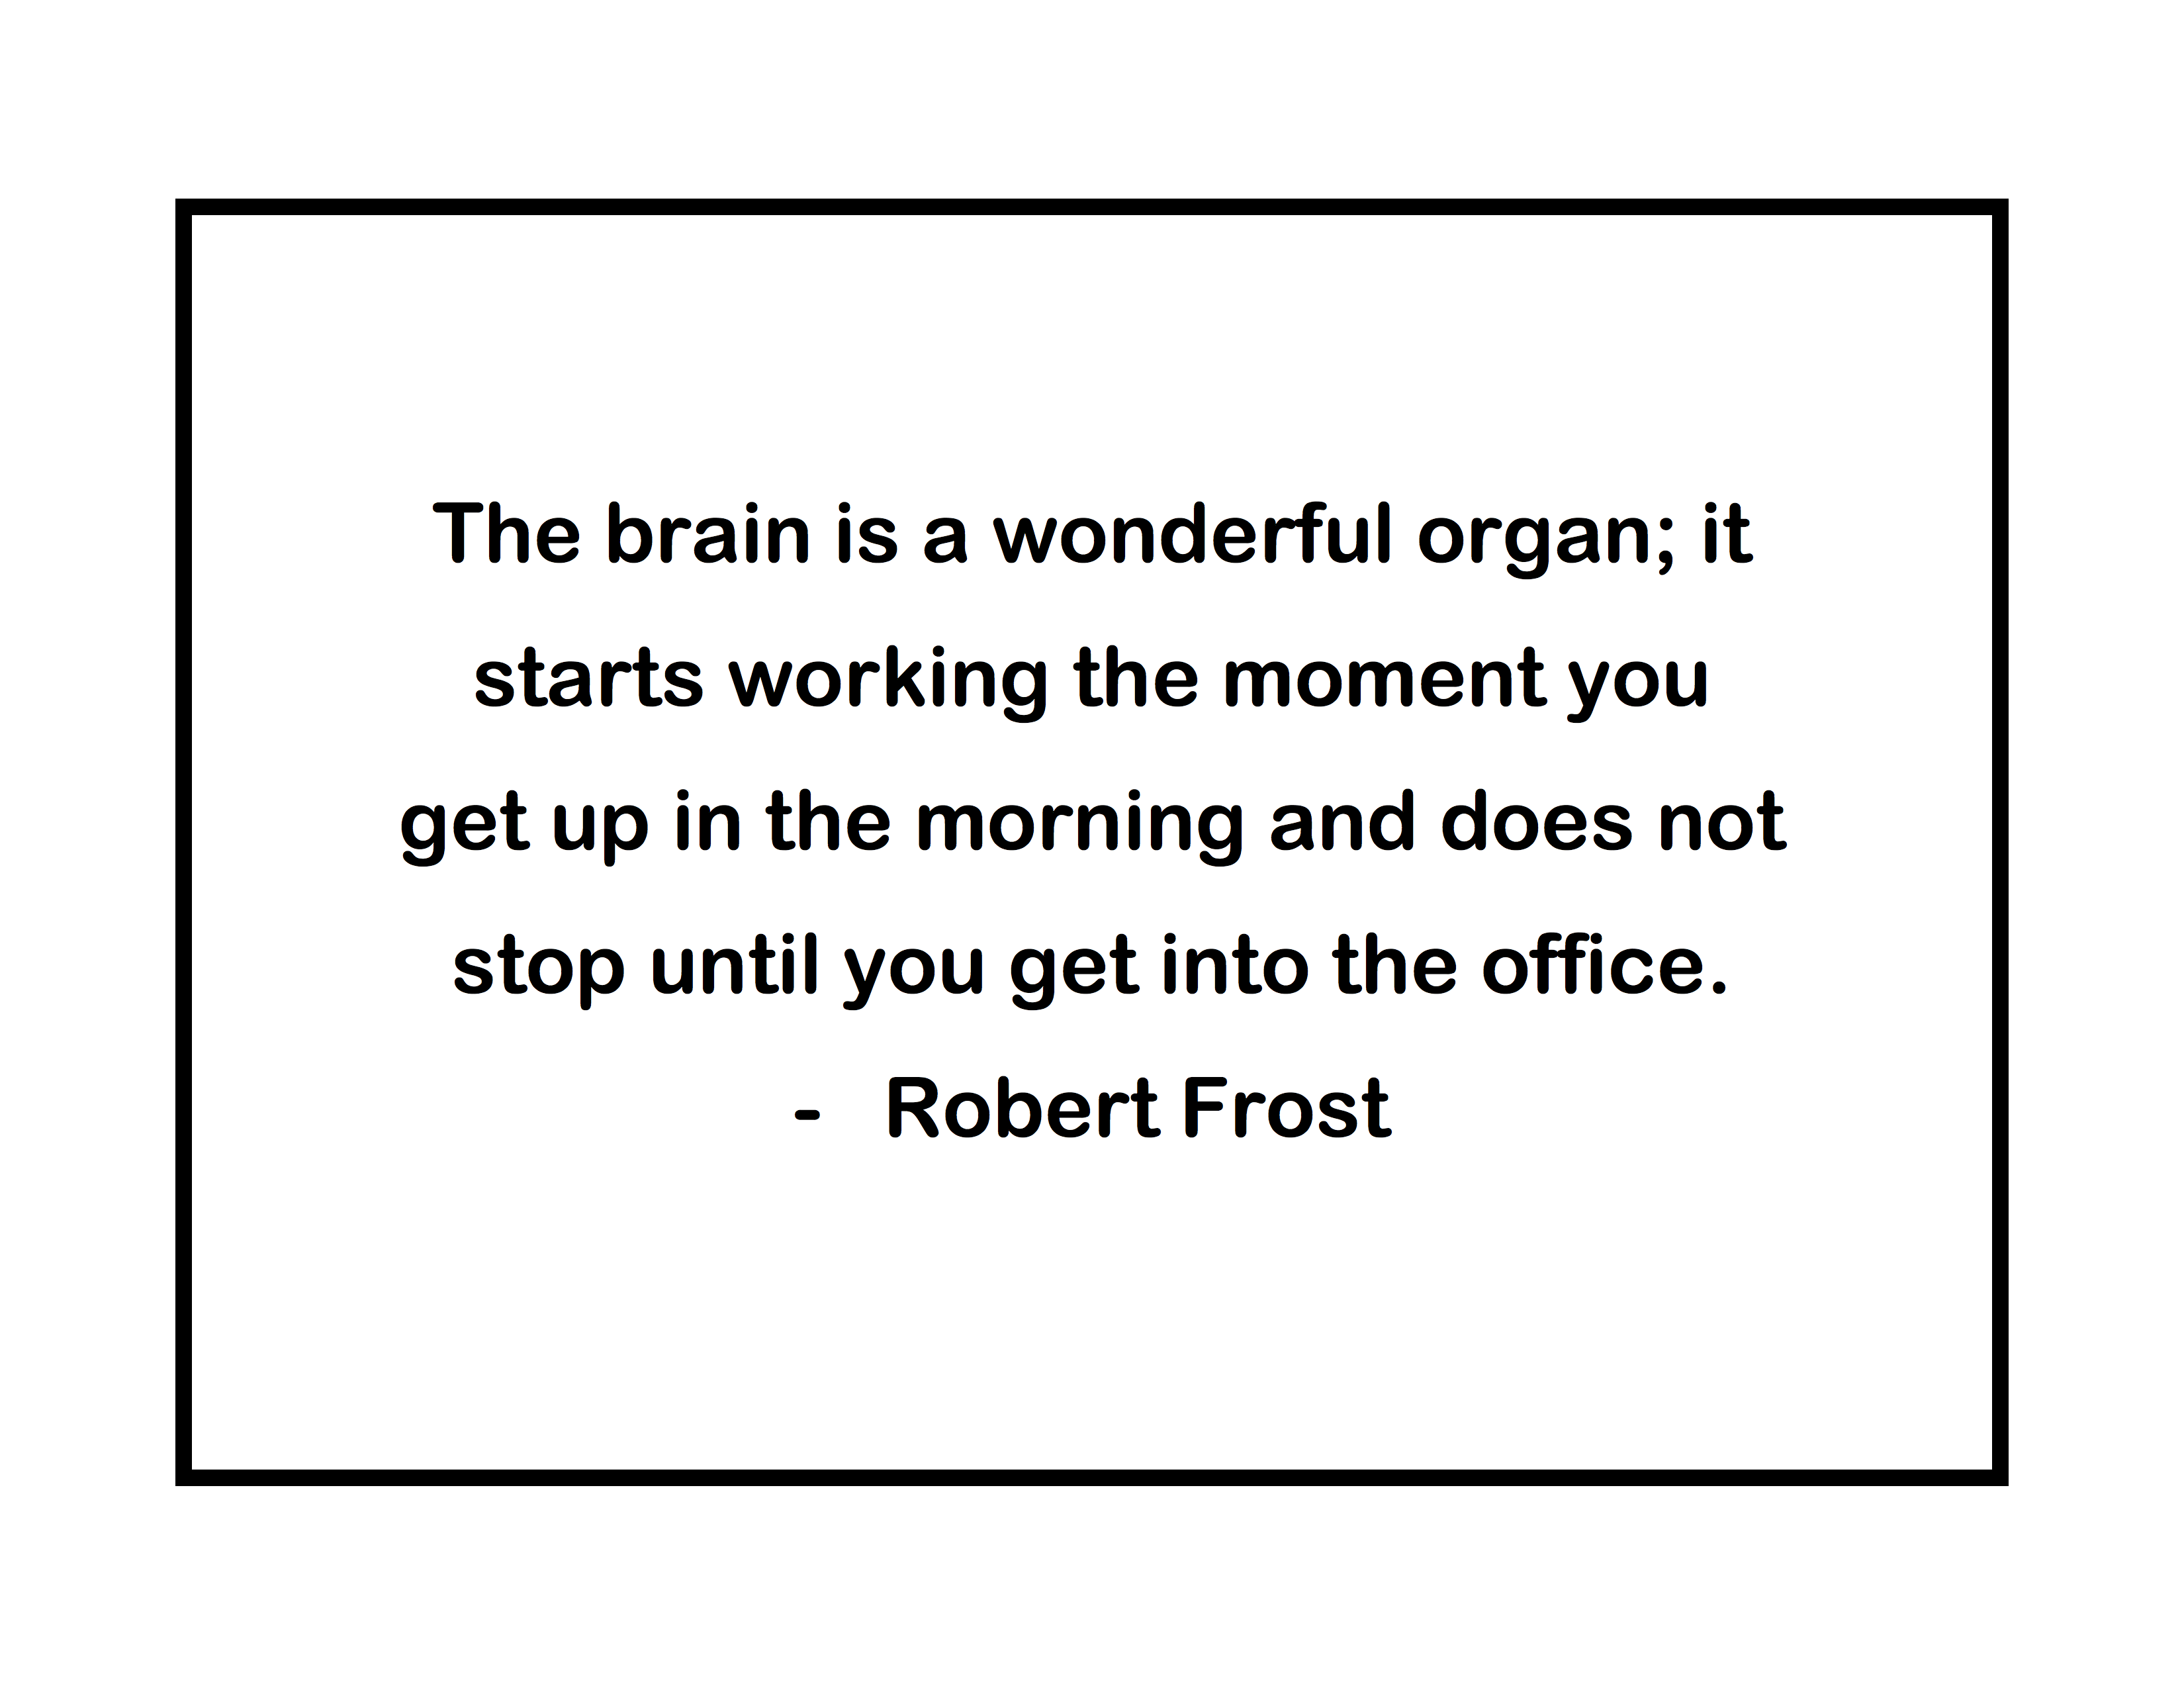 BrainWonderfulOrgan_Frost